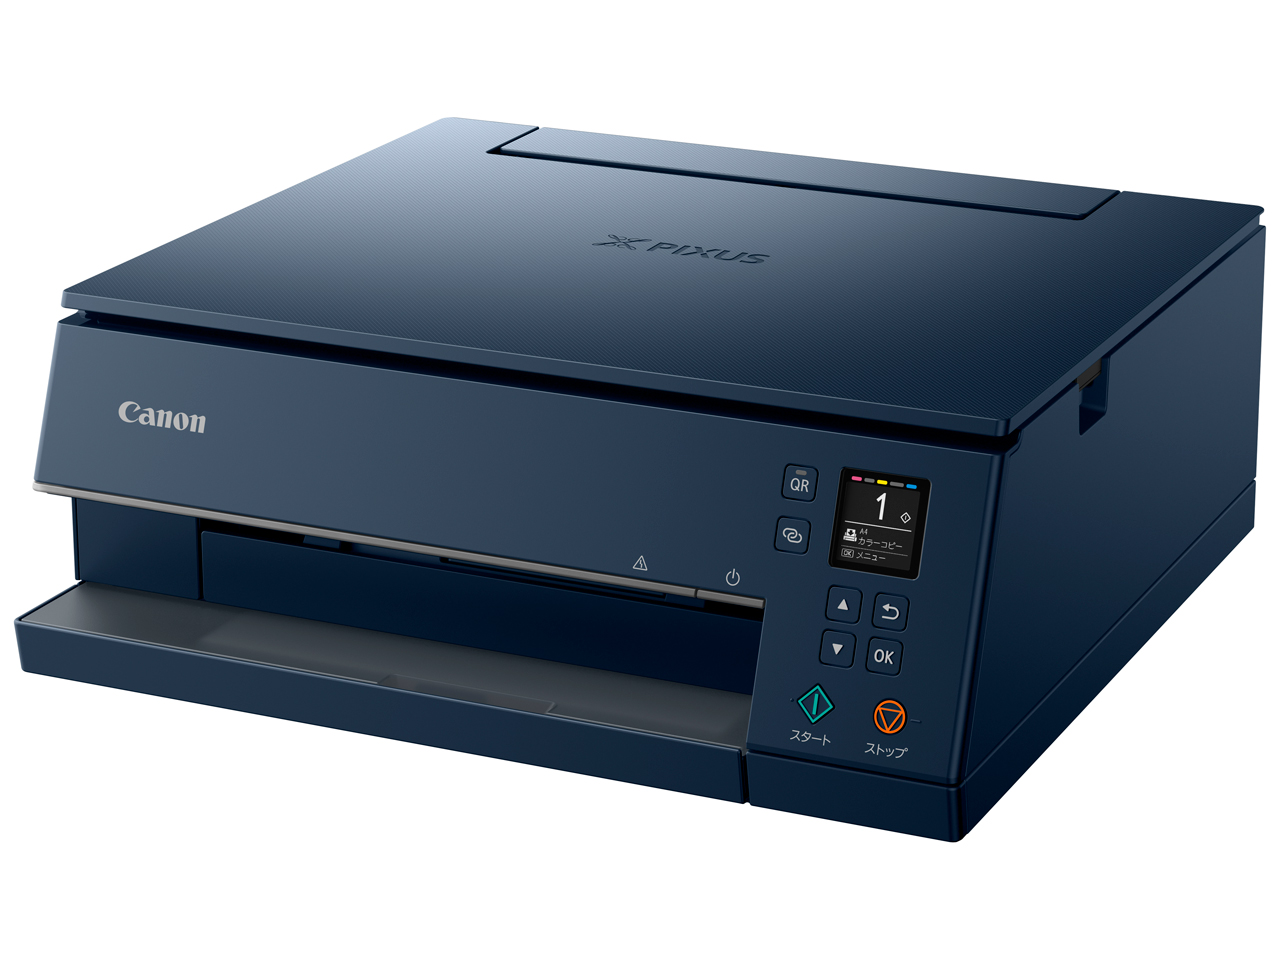 CANON キャノン PIXUSTS7330NV オールインワン複合機、5色、A4フチなし、1.44型有機EL、背面給紙/前面カセット、自動両面(はがき非対応)、スクエア/名刺プリント、自動紙幅検知 [PIXUSTS7330NV]